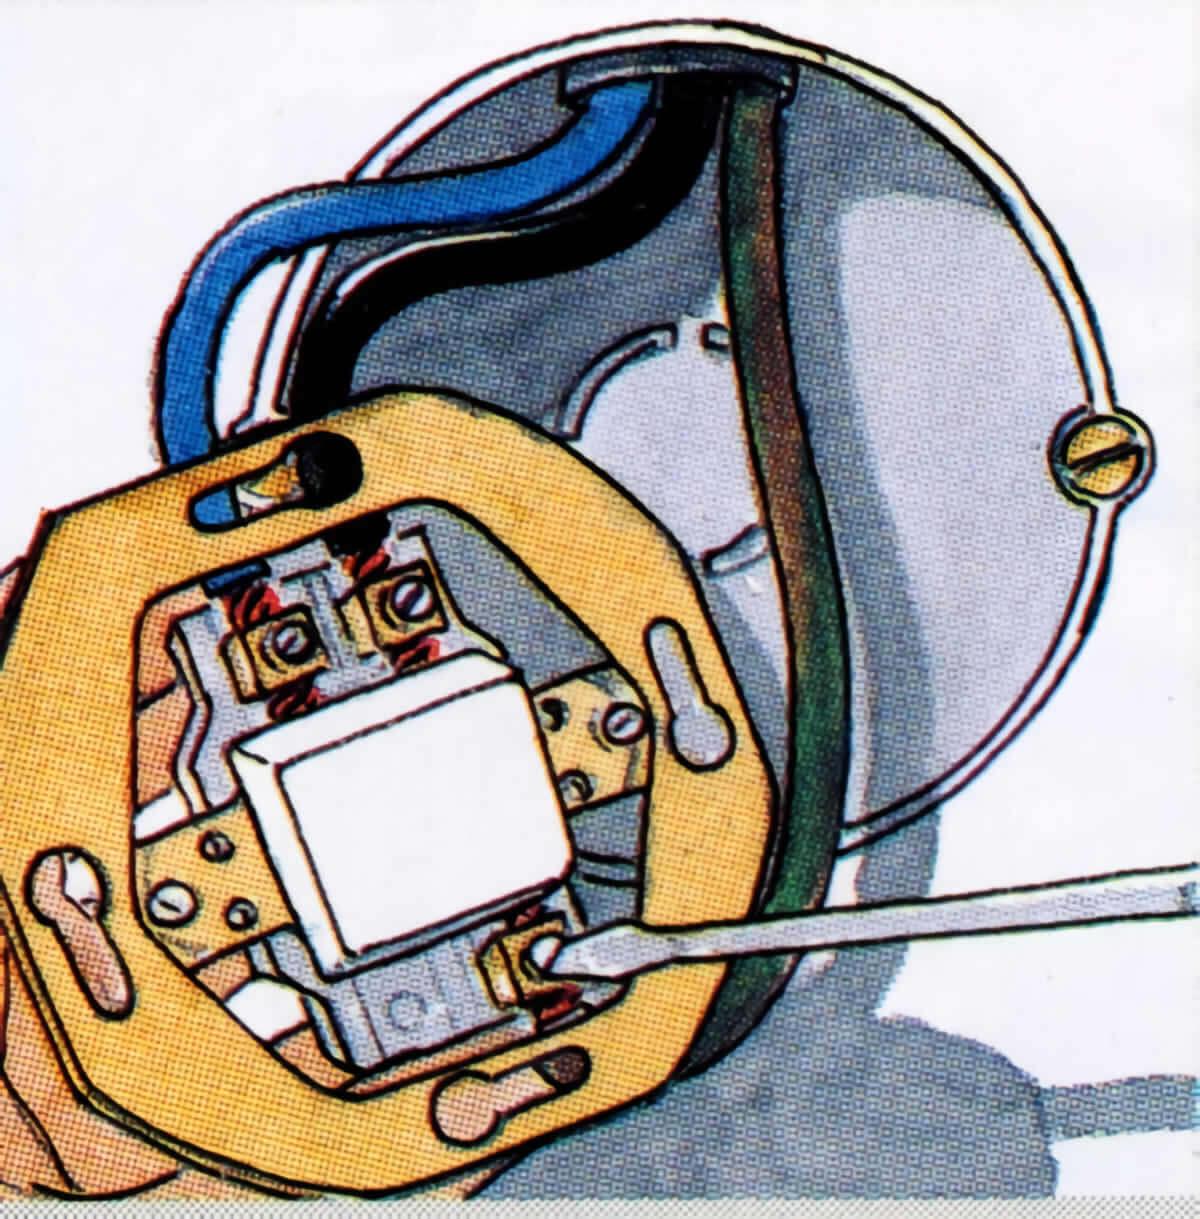 caja-electrica-4